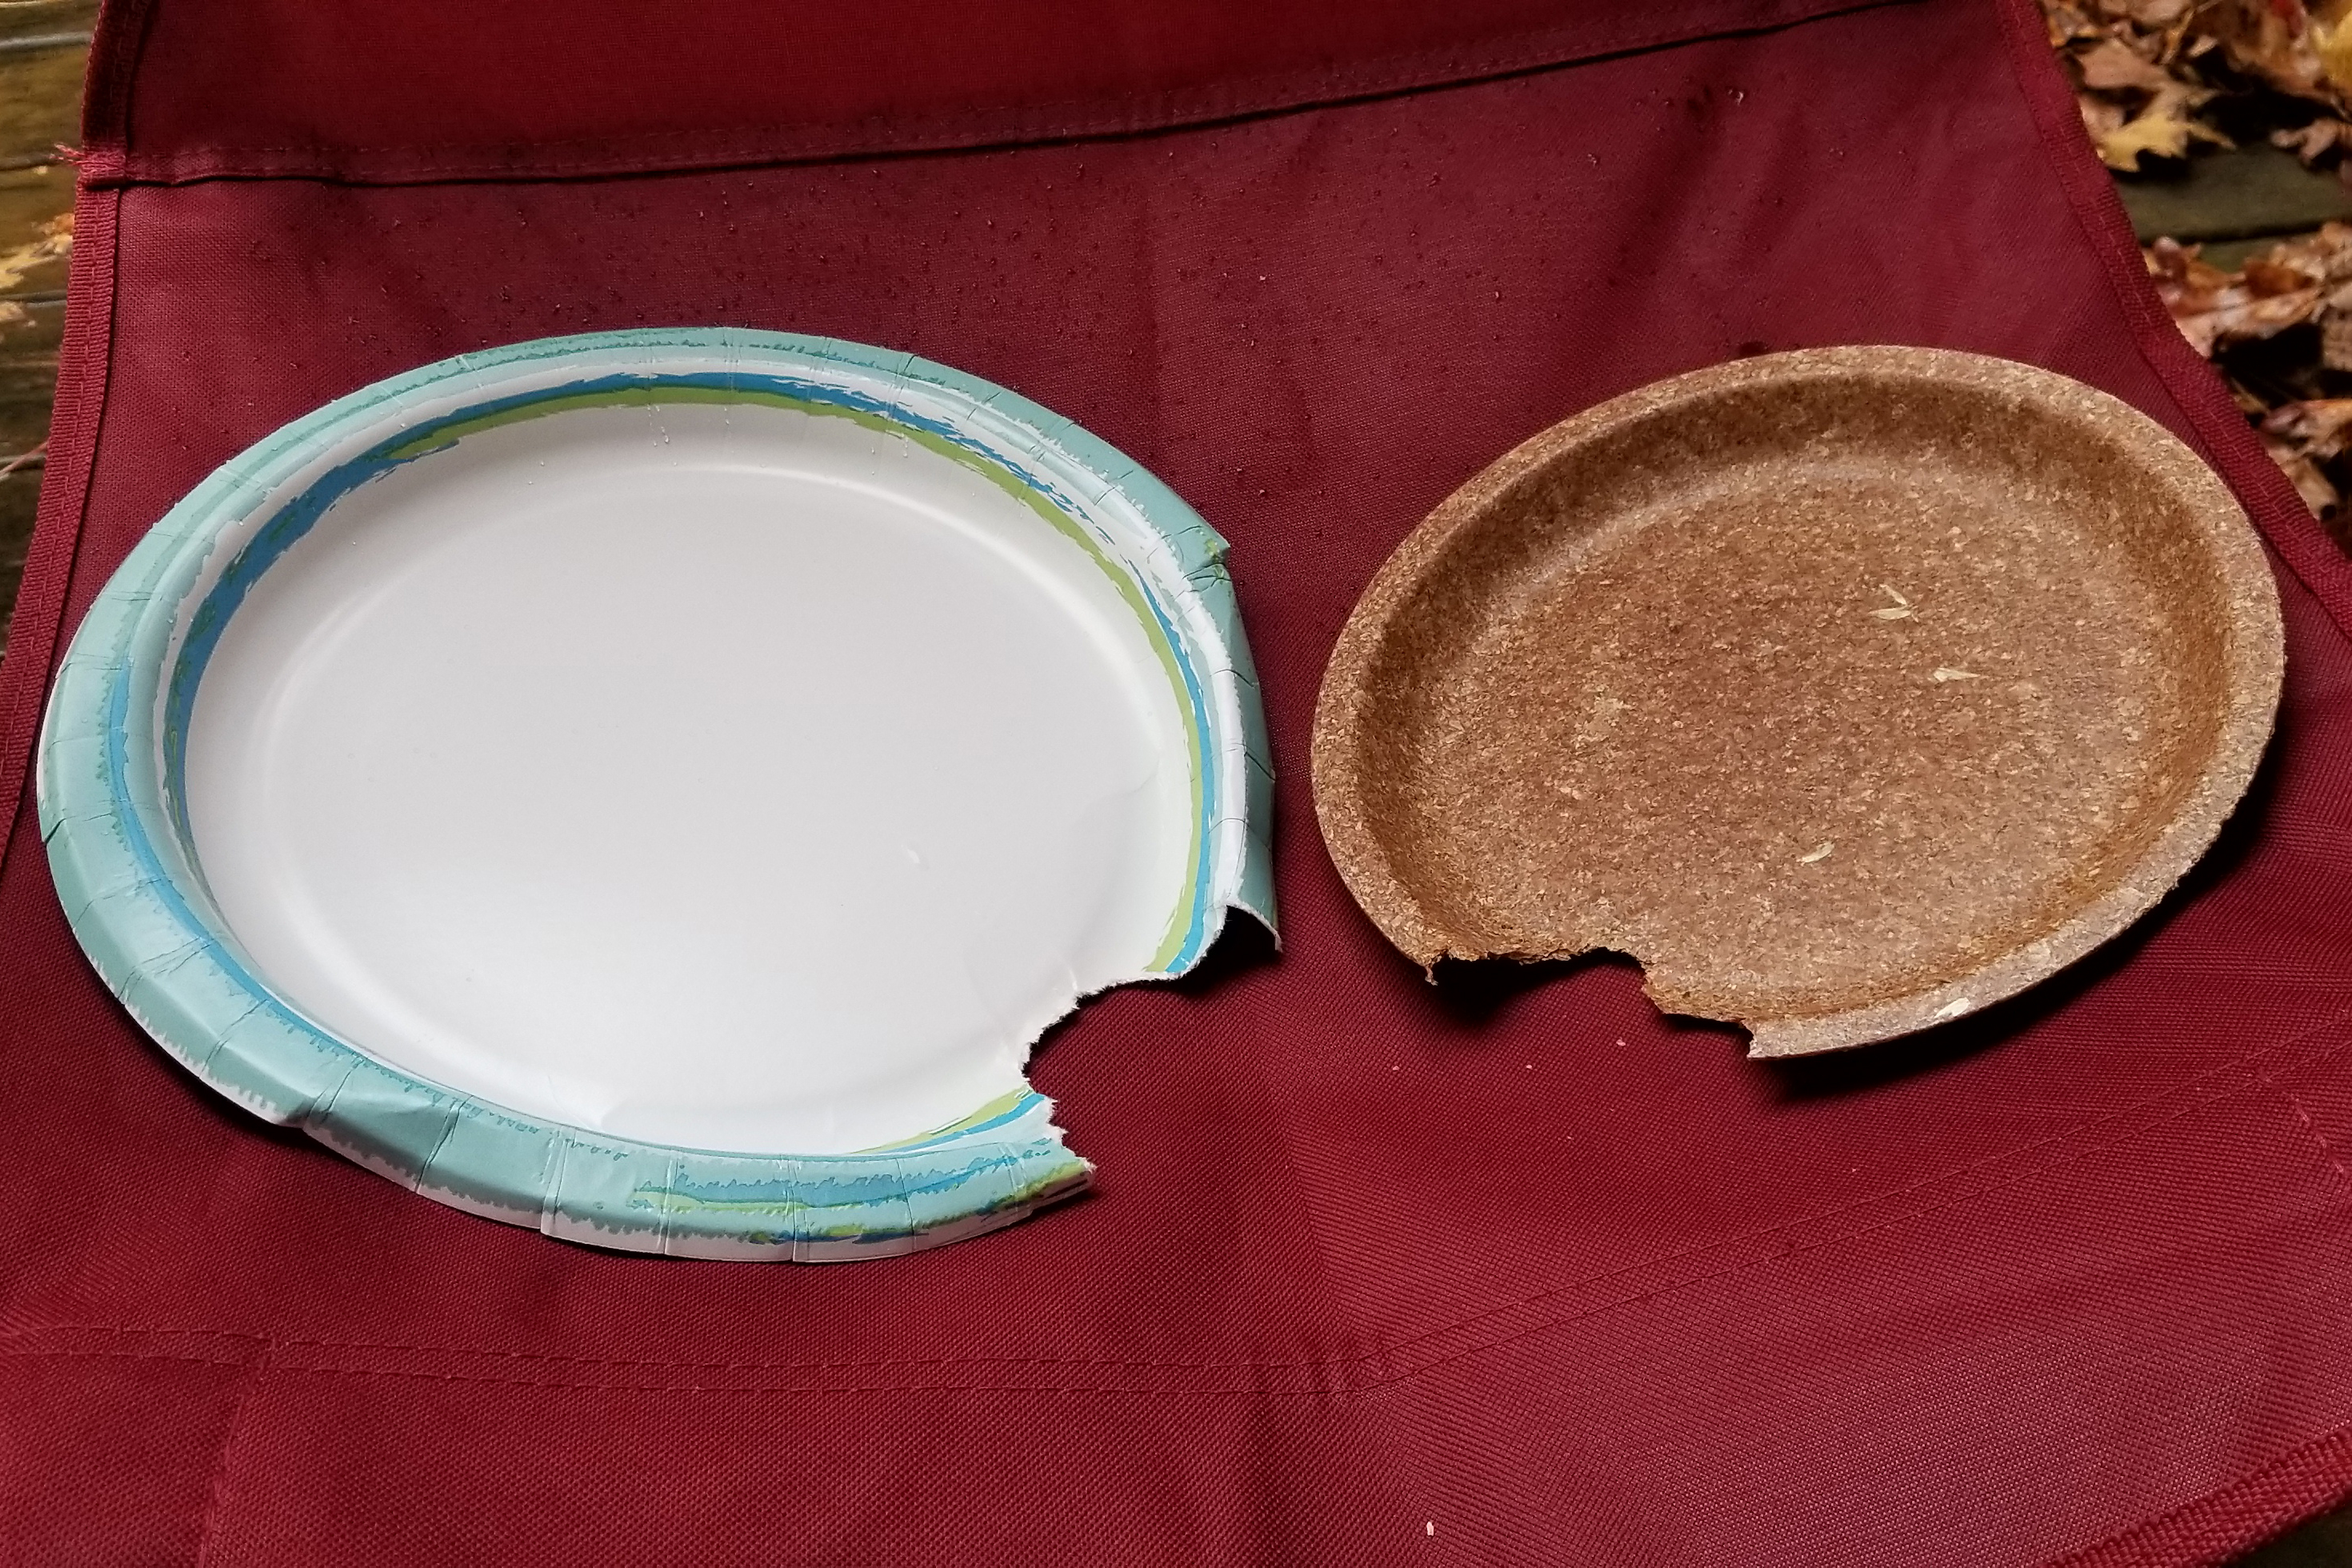 Wheat Bran biodegradable plate